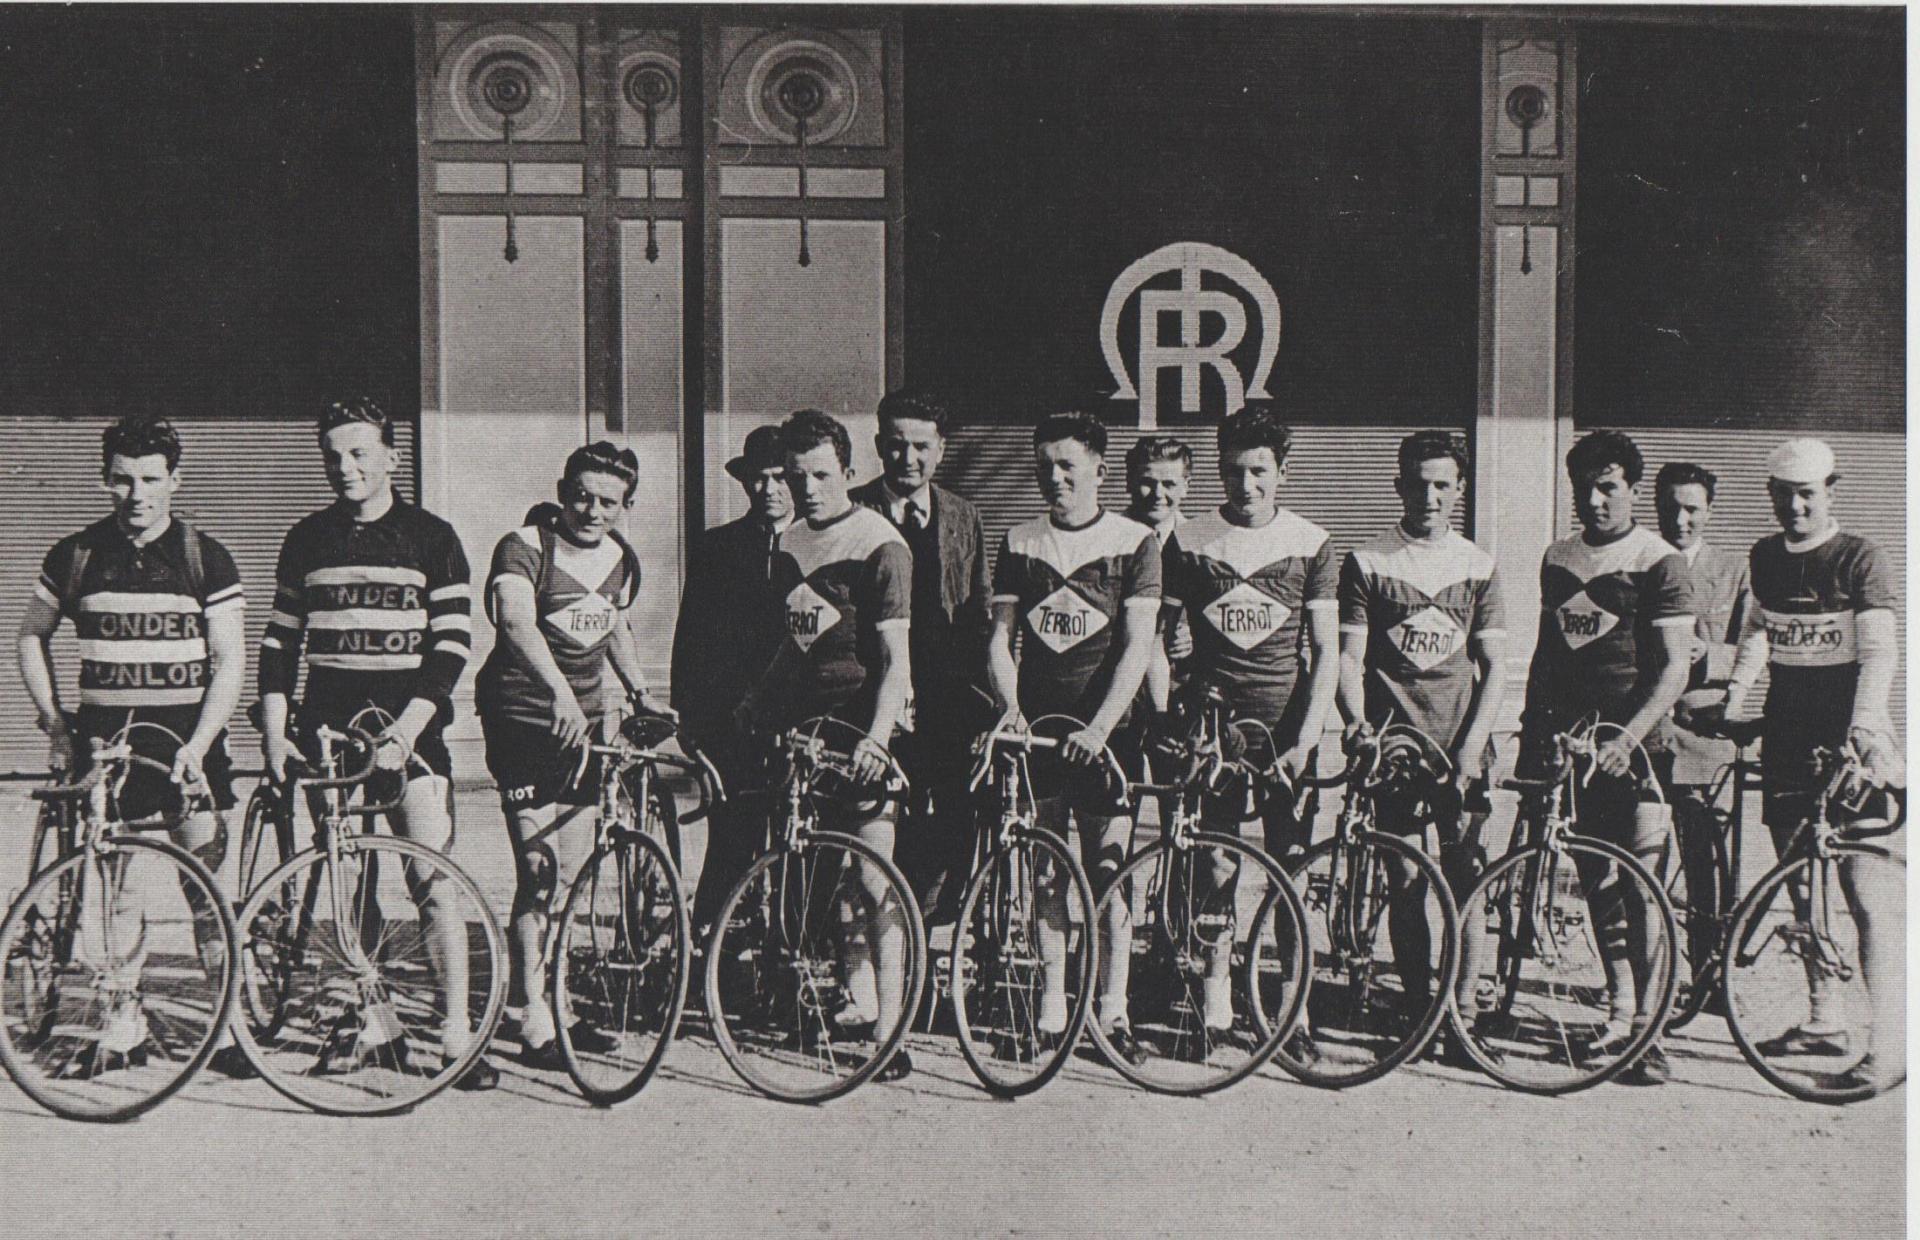 Equipe terrot mars 1950 nouvelles galeries